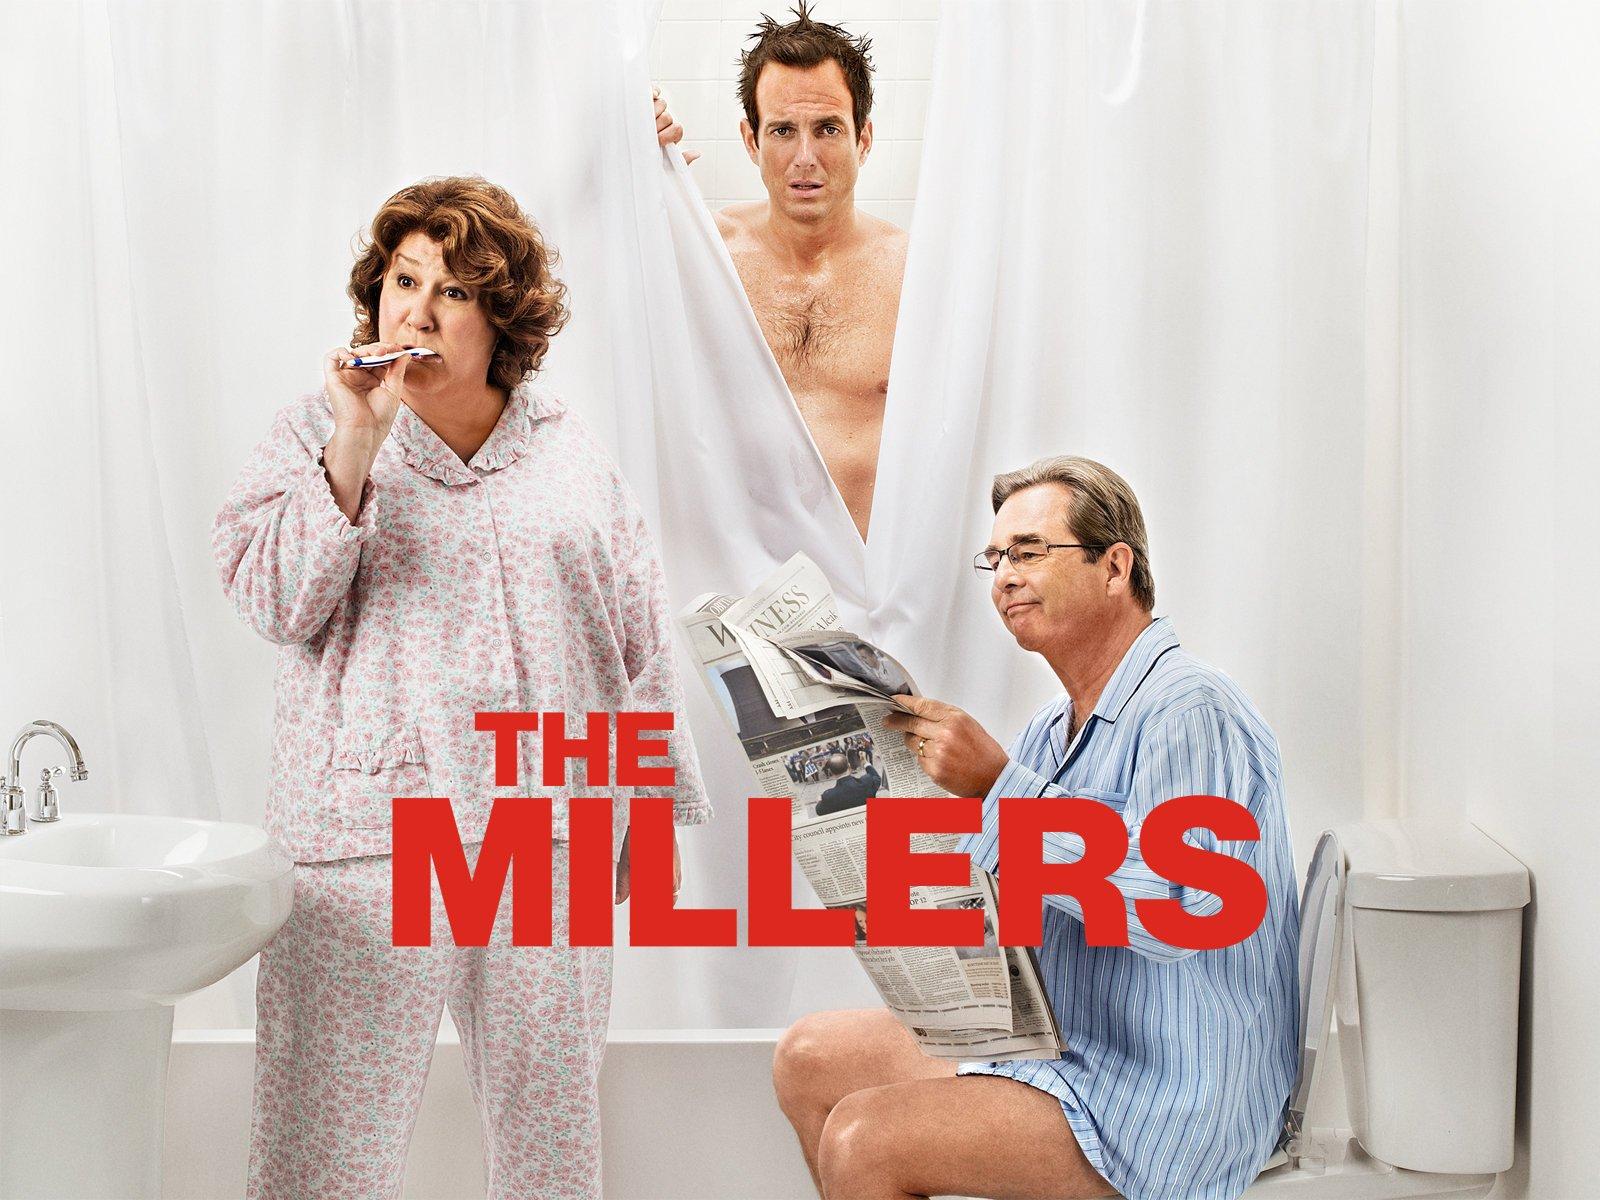 IMDB de Millers internet dating